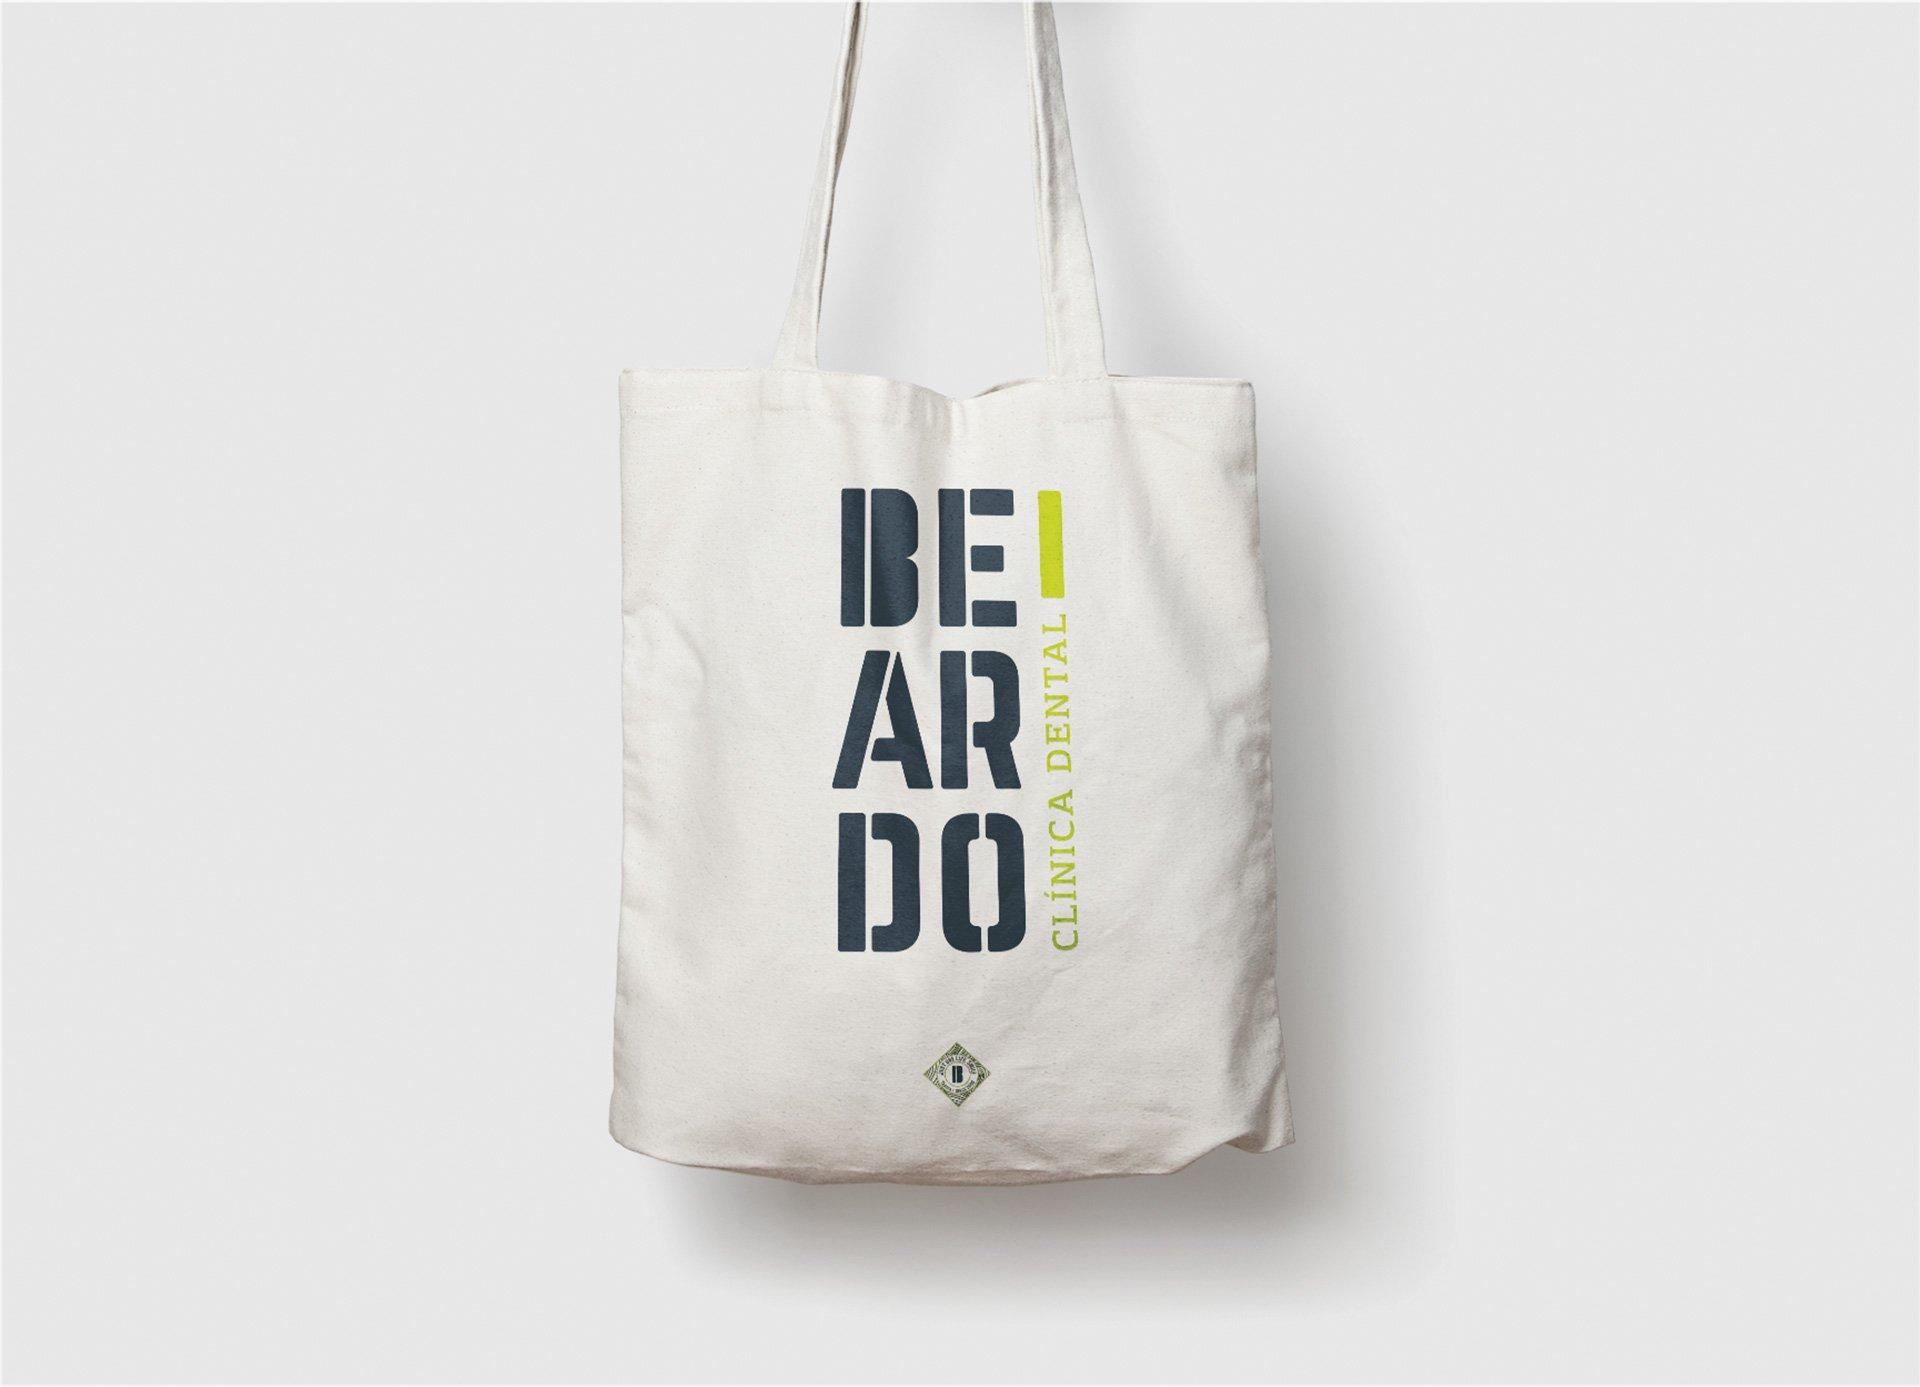 diseño-bolsa-clinica-beardo-tarifa